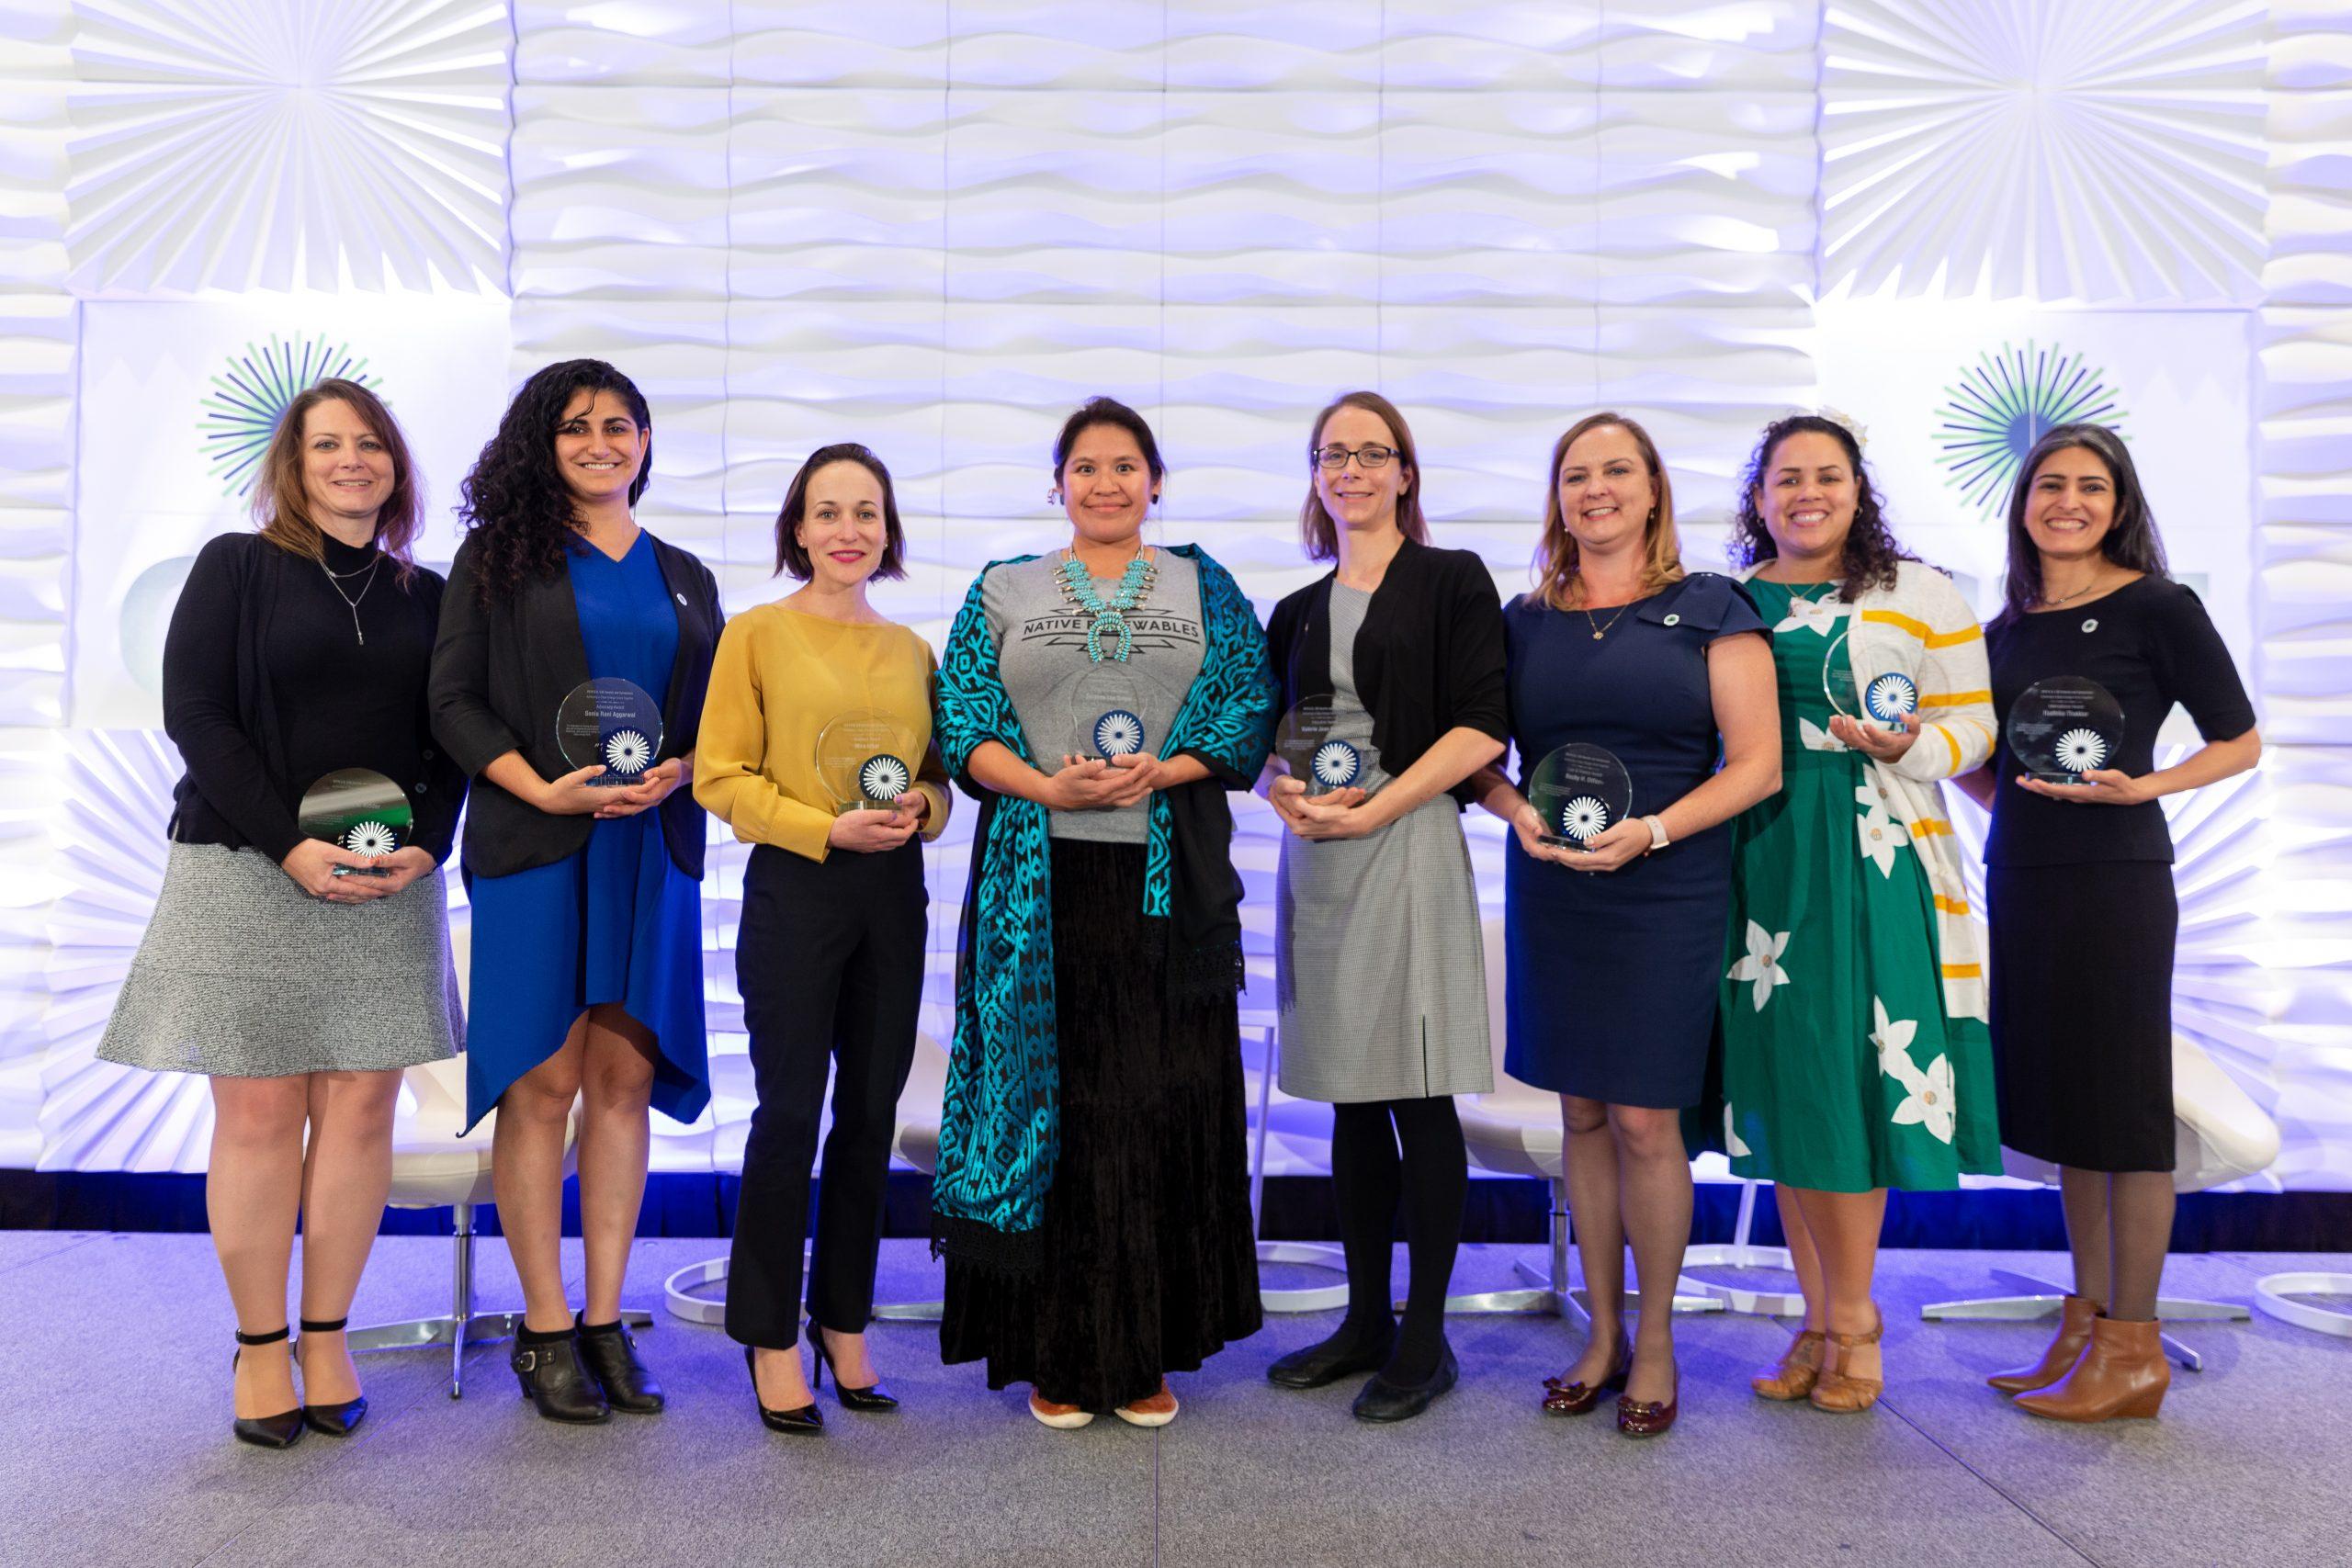 2019 U.S. C3E awardees